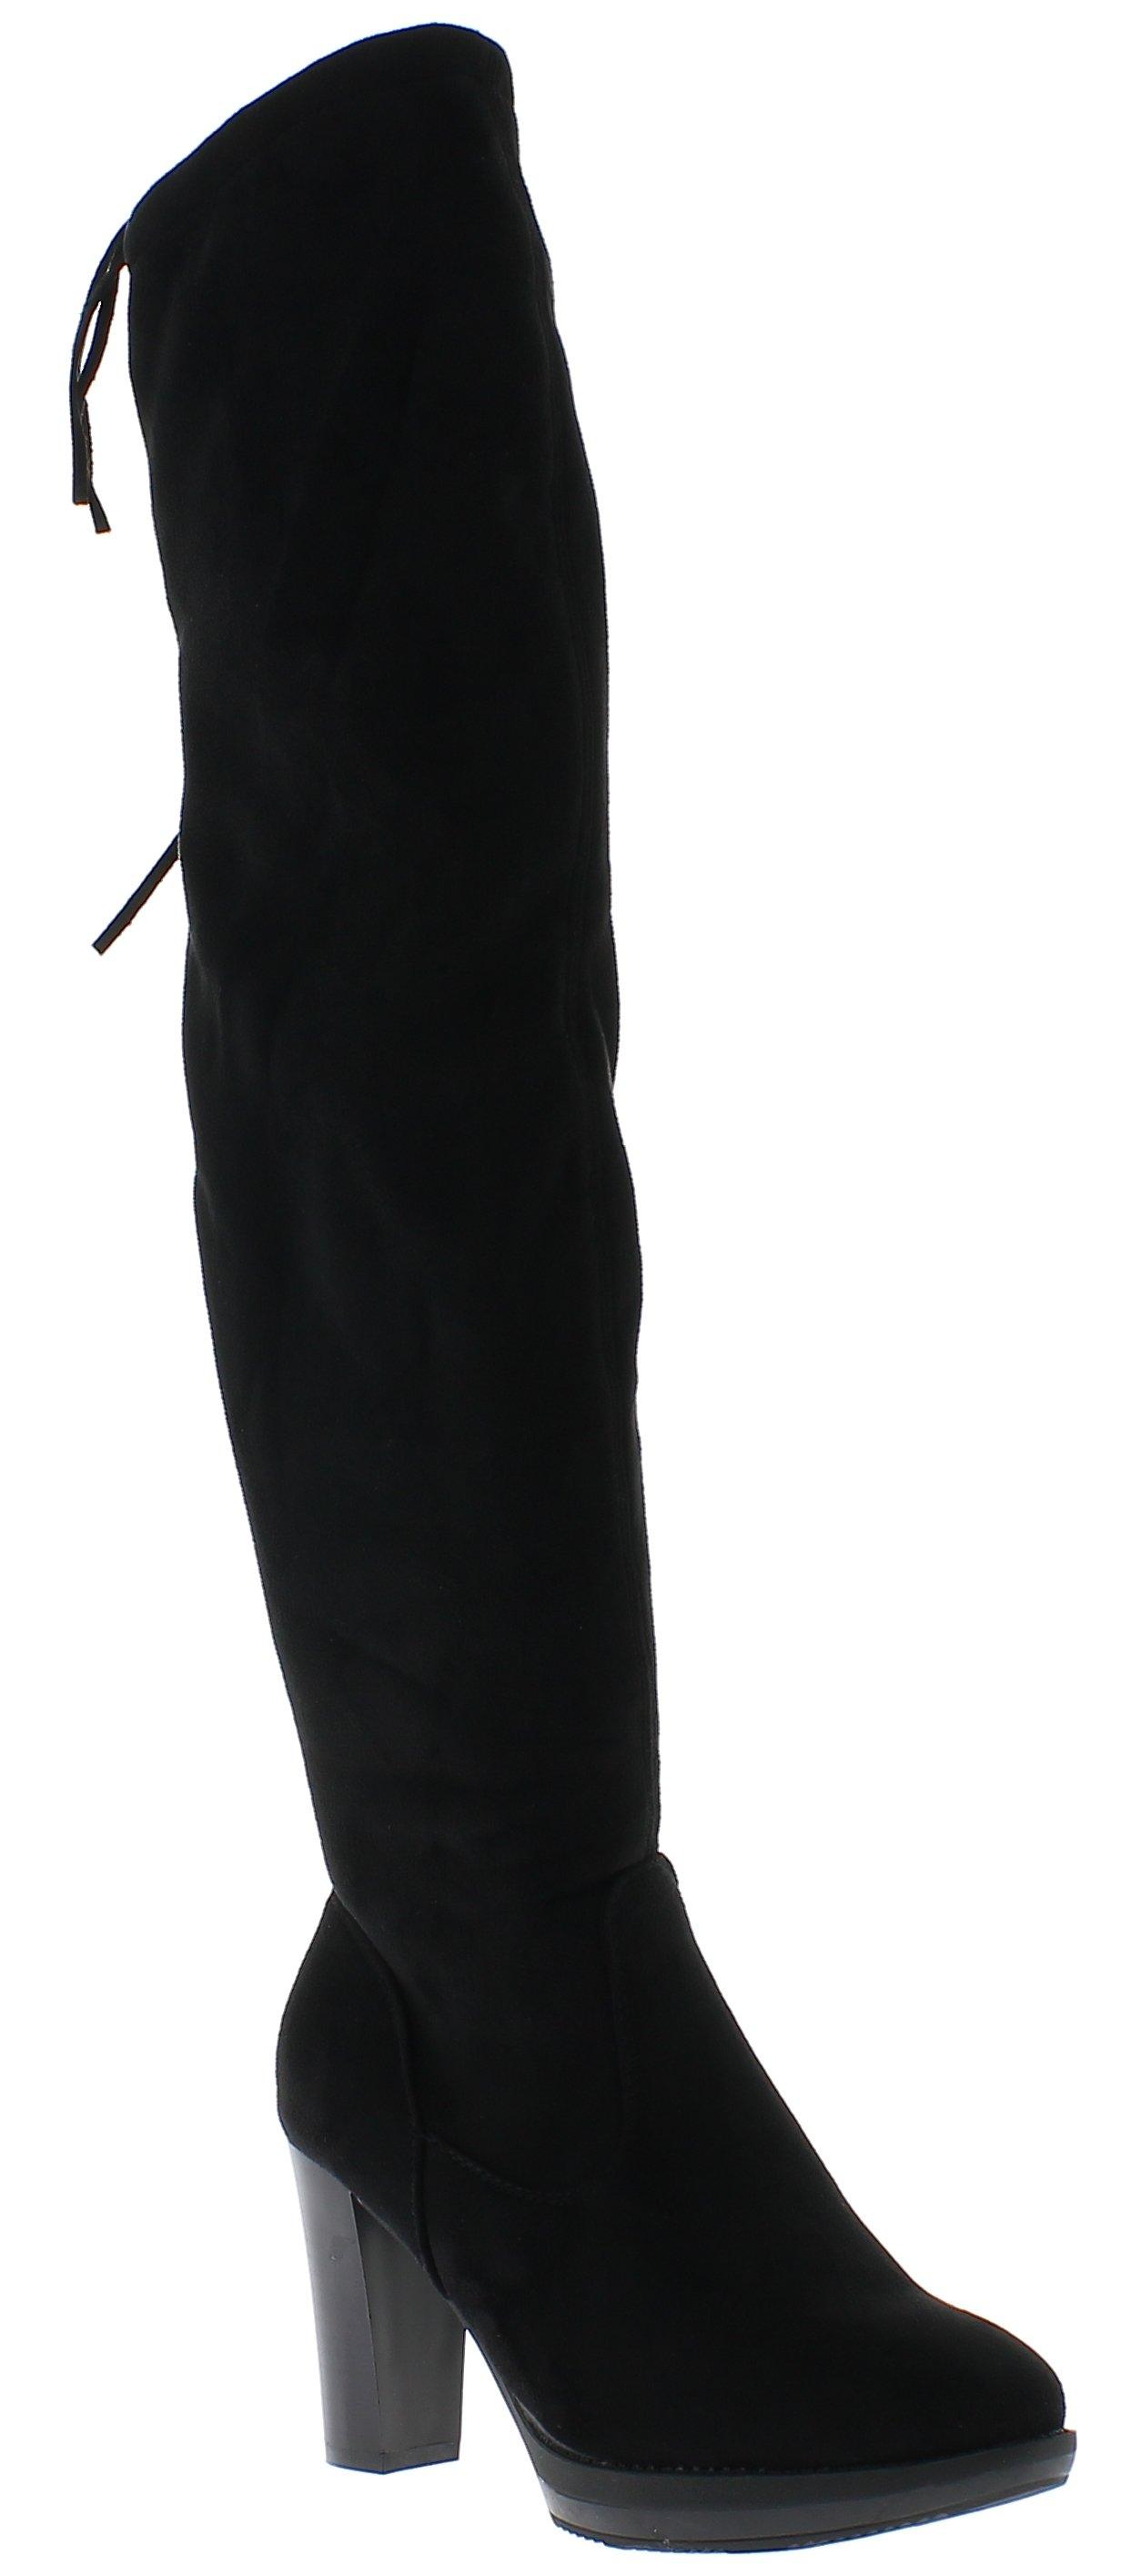 IQSHOES Γυναικεία Μπότα YY8228 Μαύρο - IqShoes - YY8228 BLACK -black-36/1/15/7 παπούτσια  γυναικεία μποτάκια